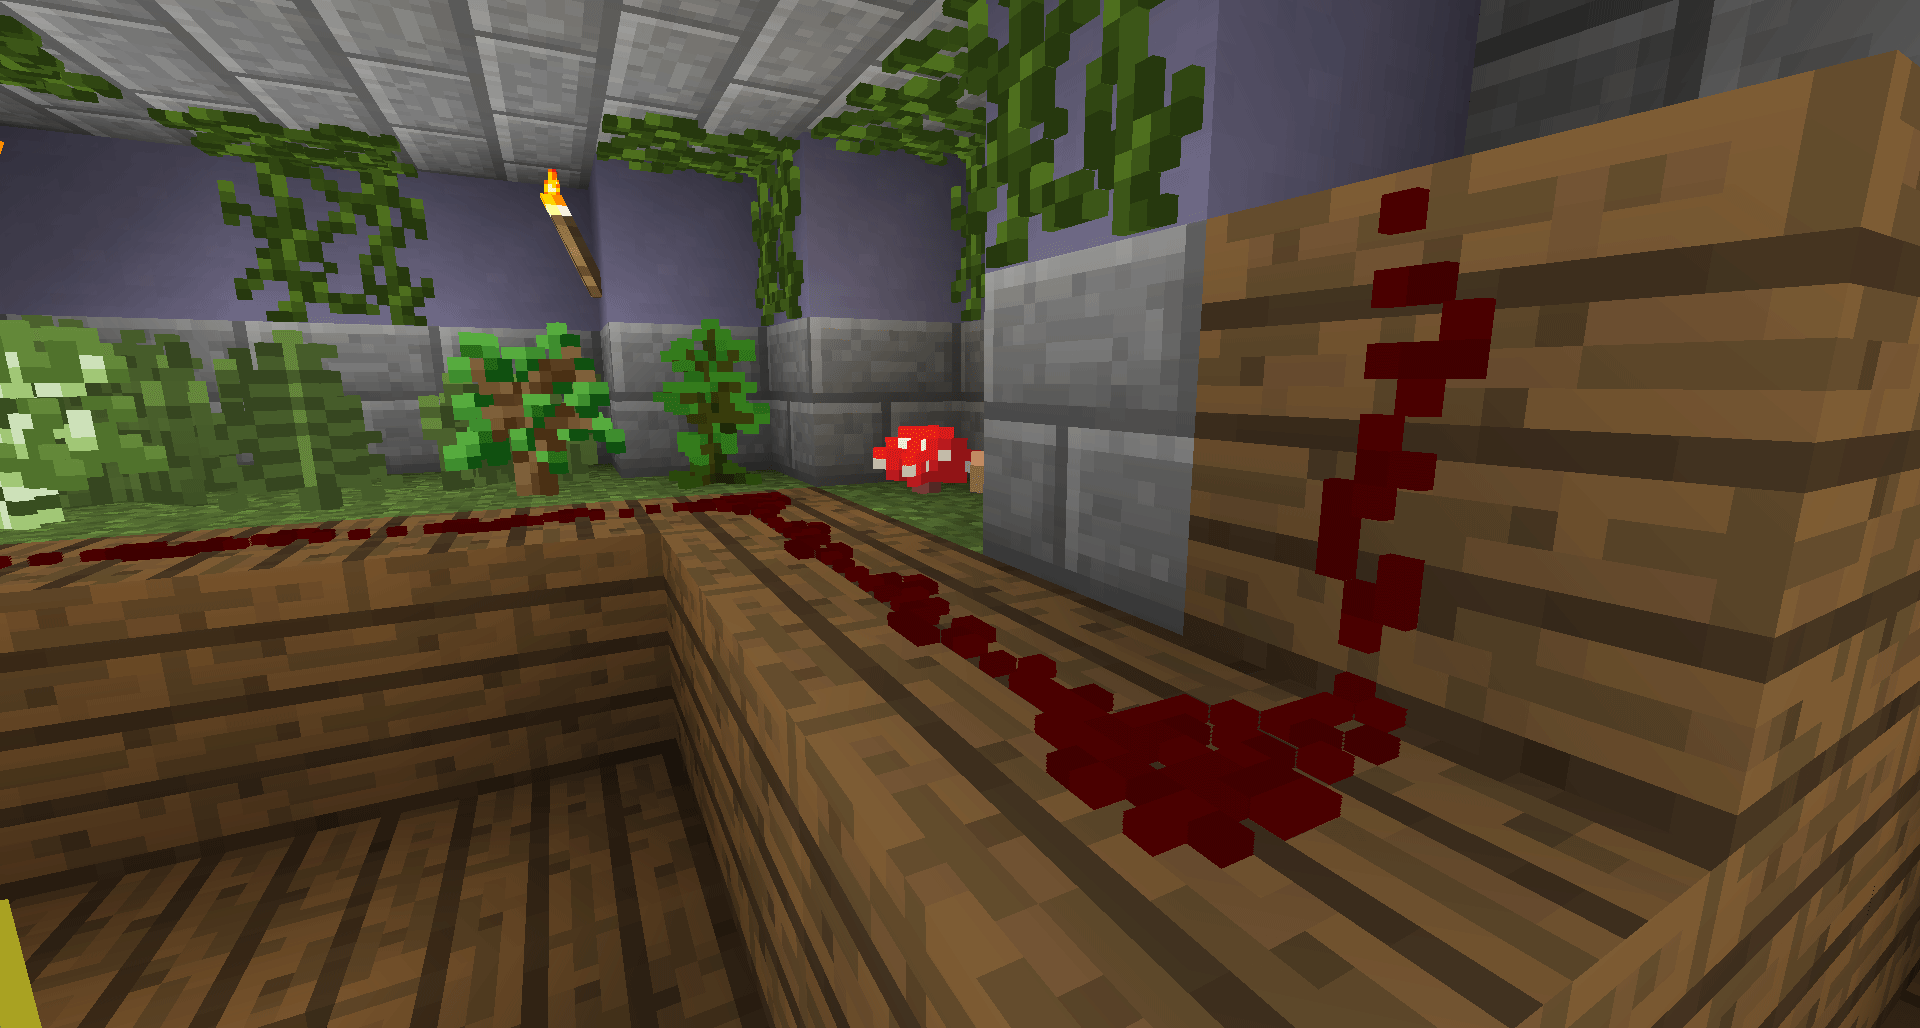 Blocks3d-mod-1.png